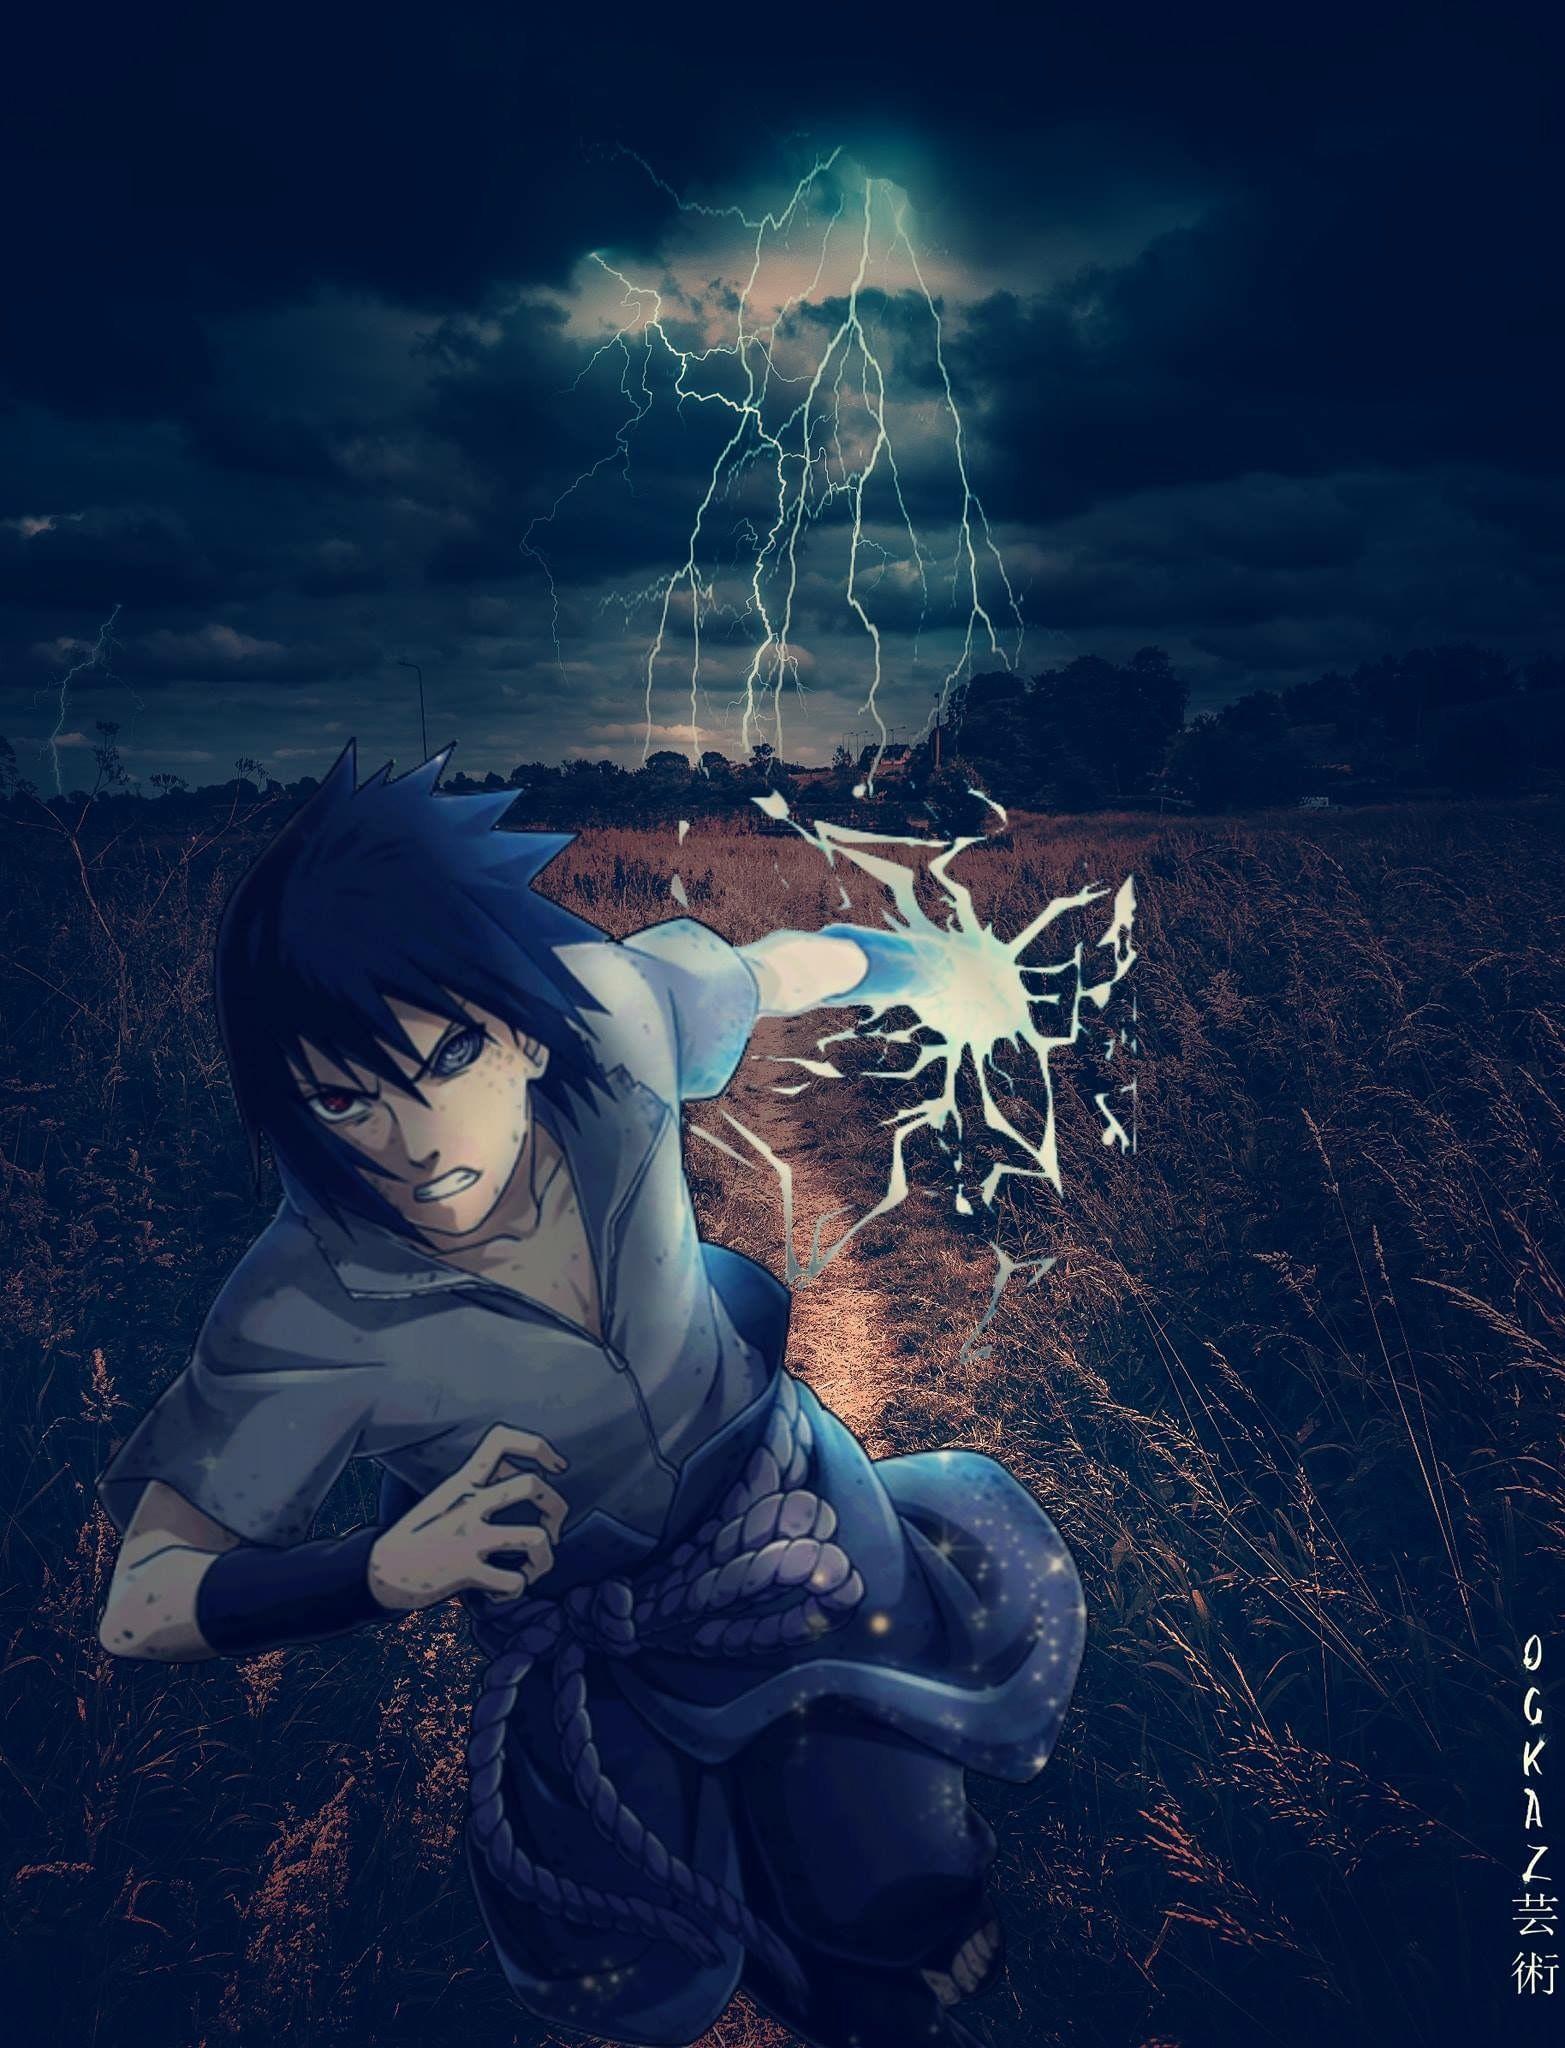 Pin Oleh Riki Di Anime Uchihas Animasi Gambar